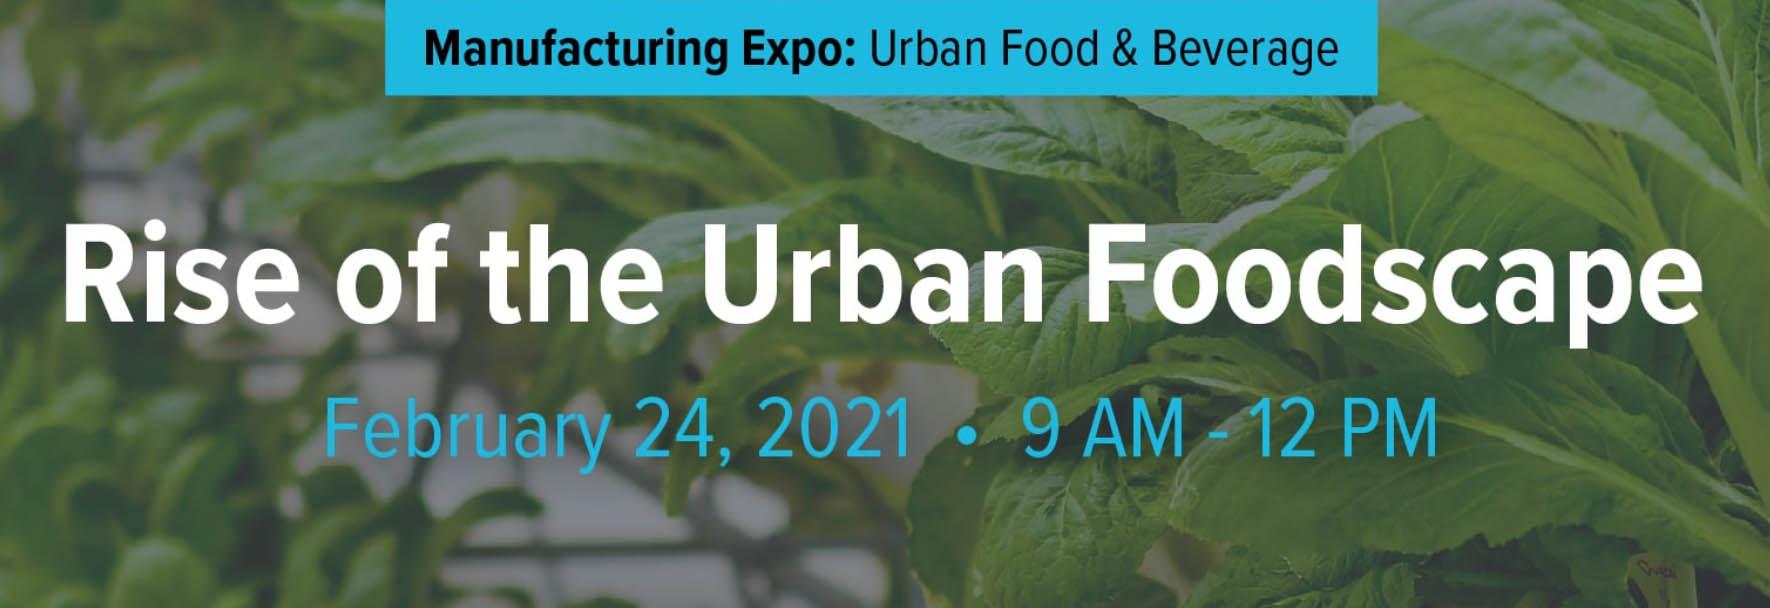 FuzeHub event flyer